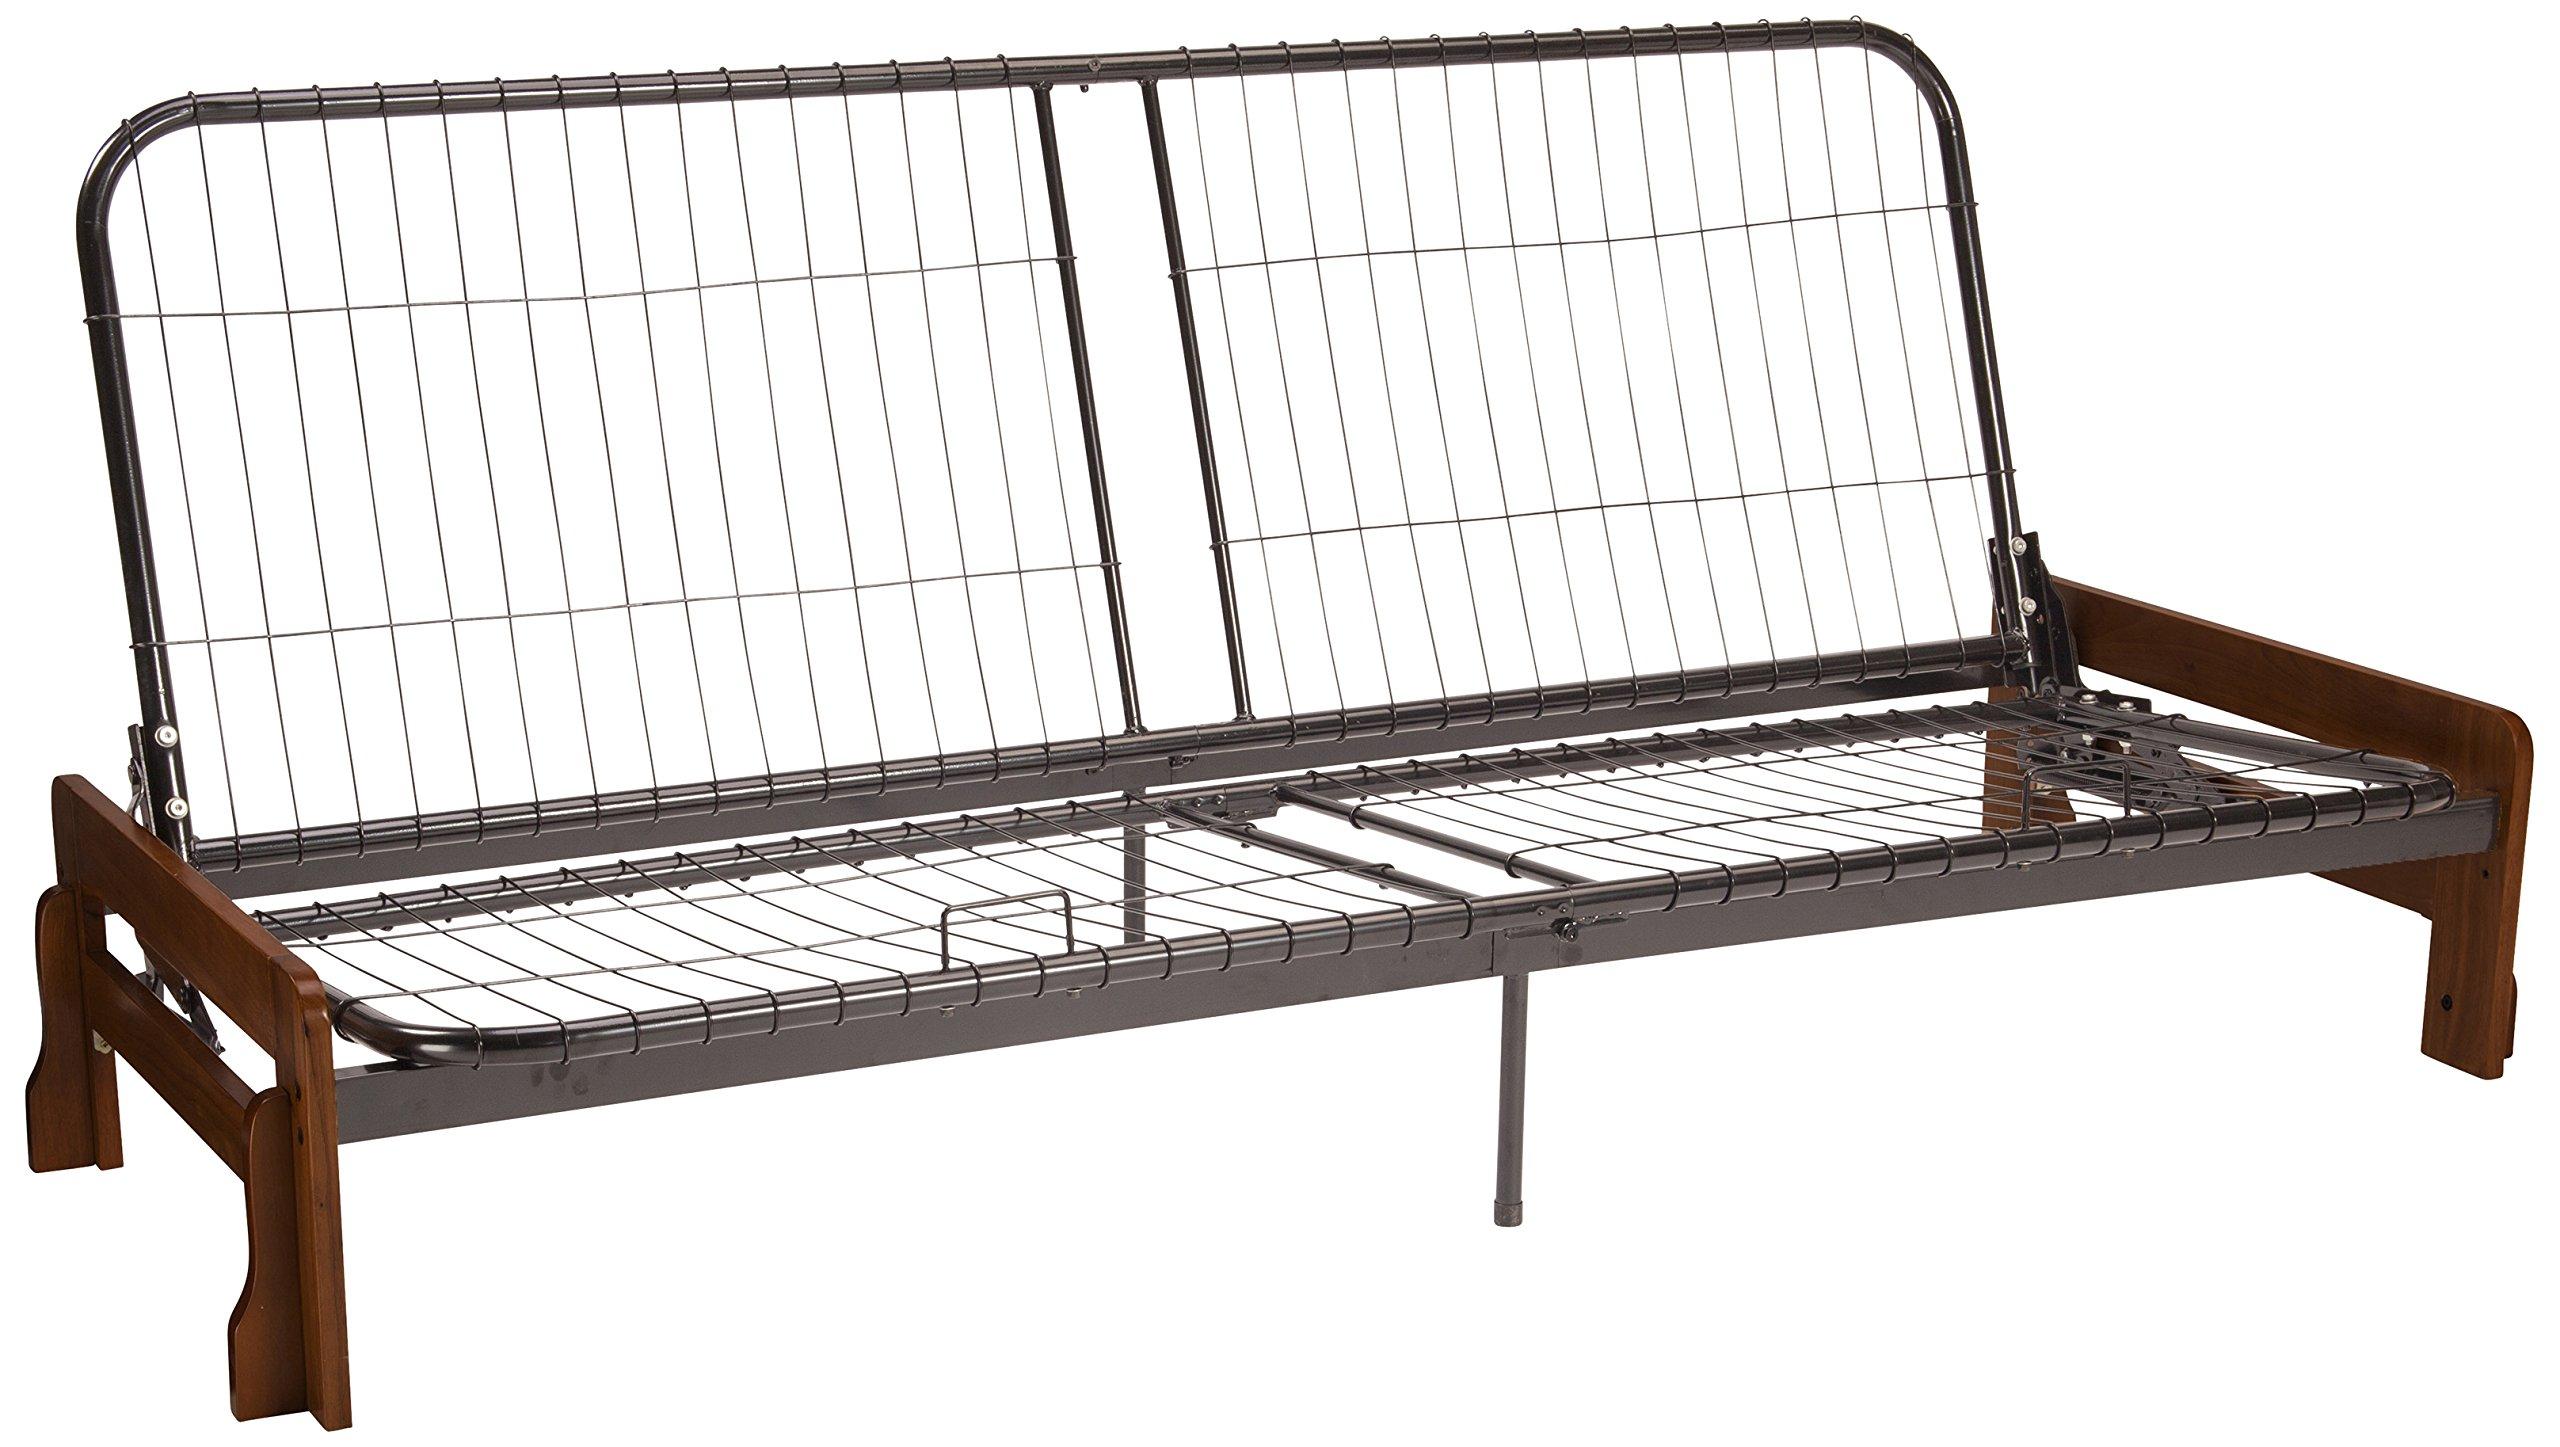 Bali Futon Sofa Sleeper Bed Frame, Full-size, Walnut Arm Finish by Epic Furnishings